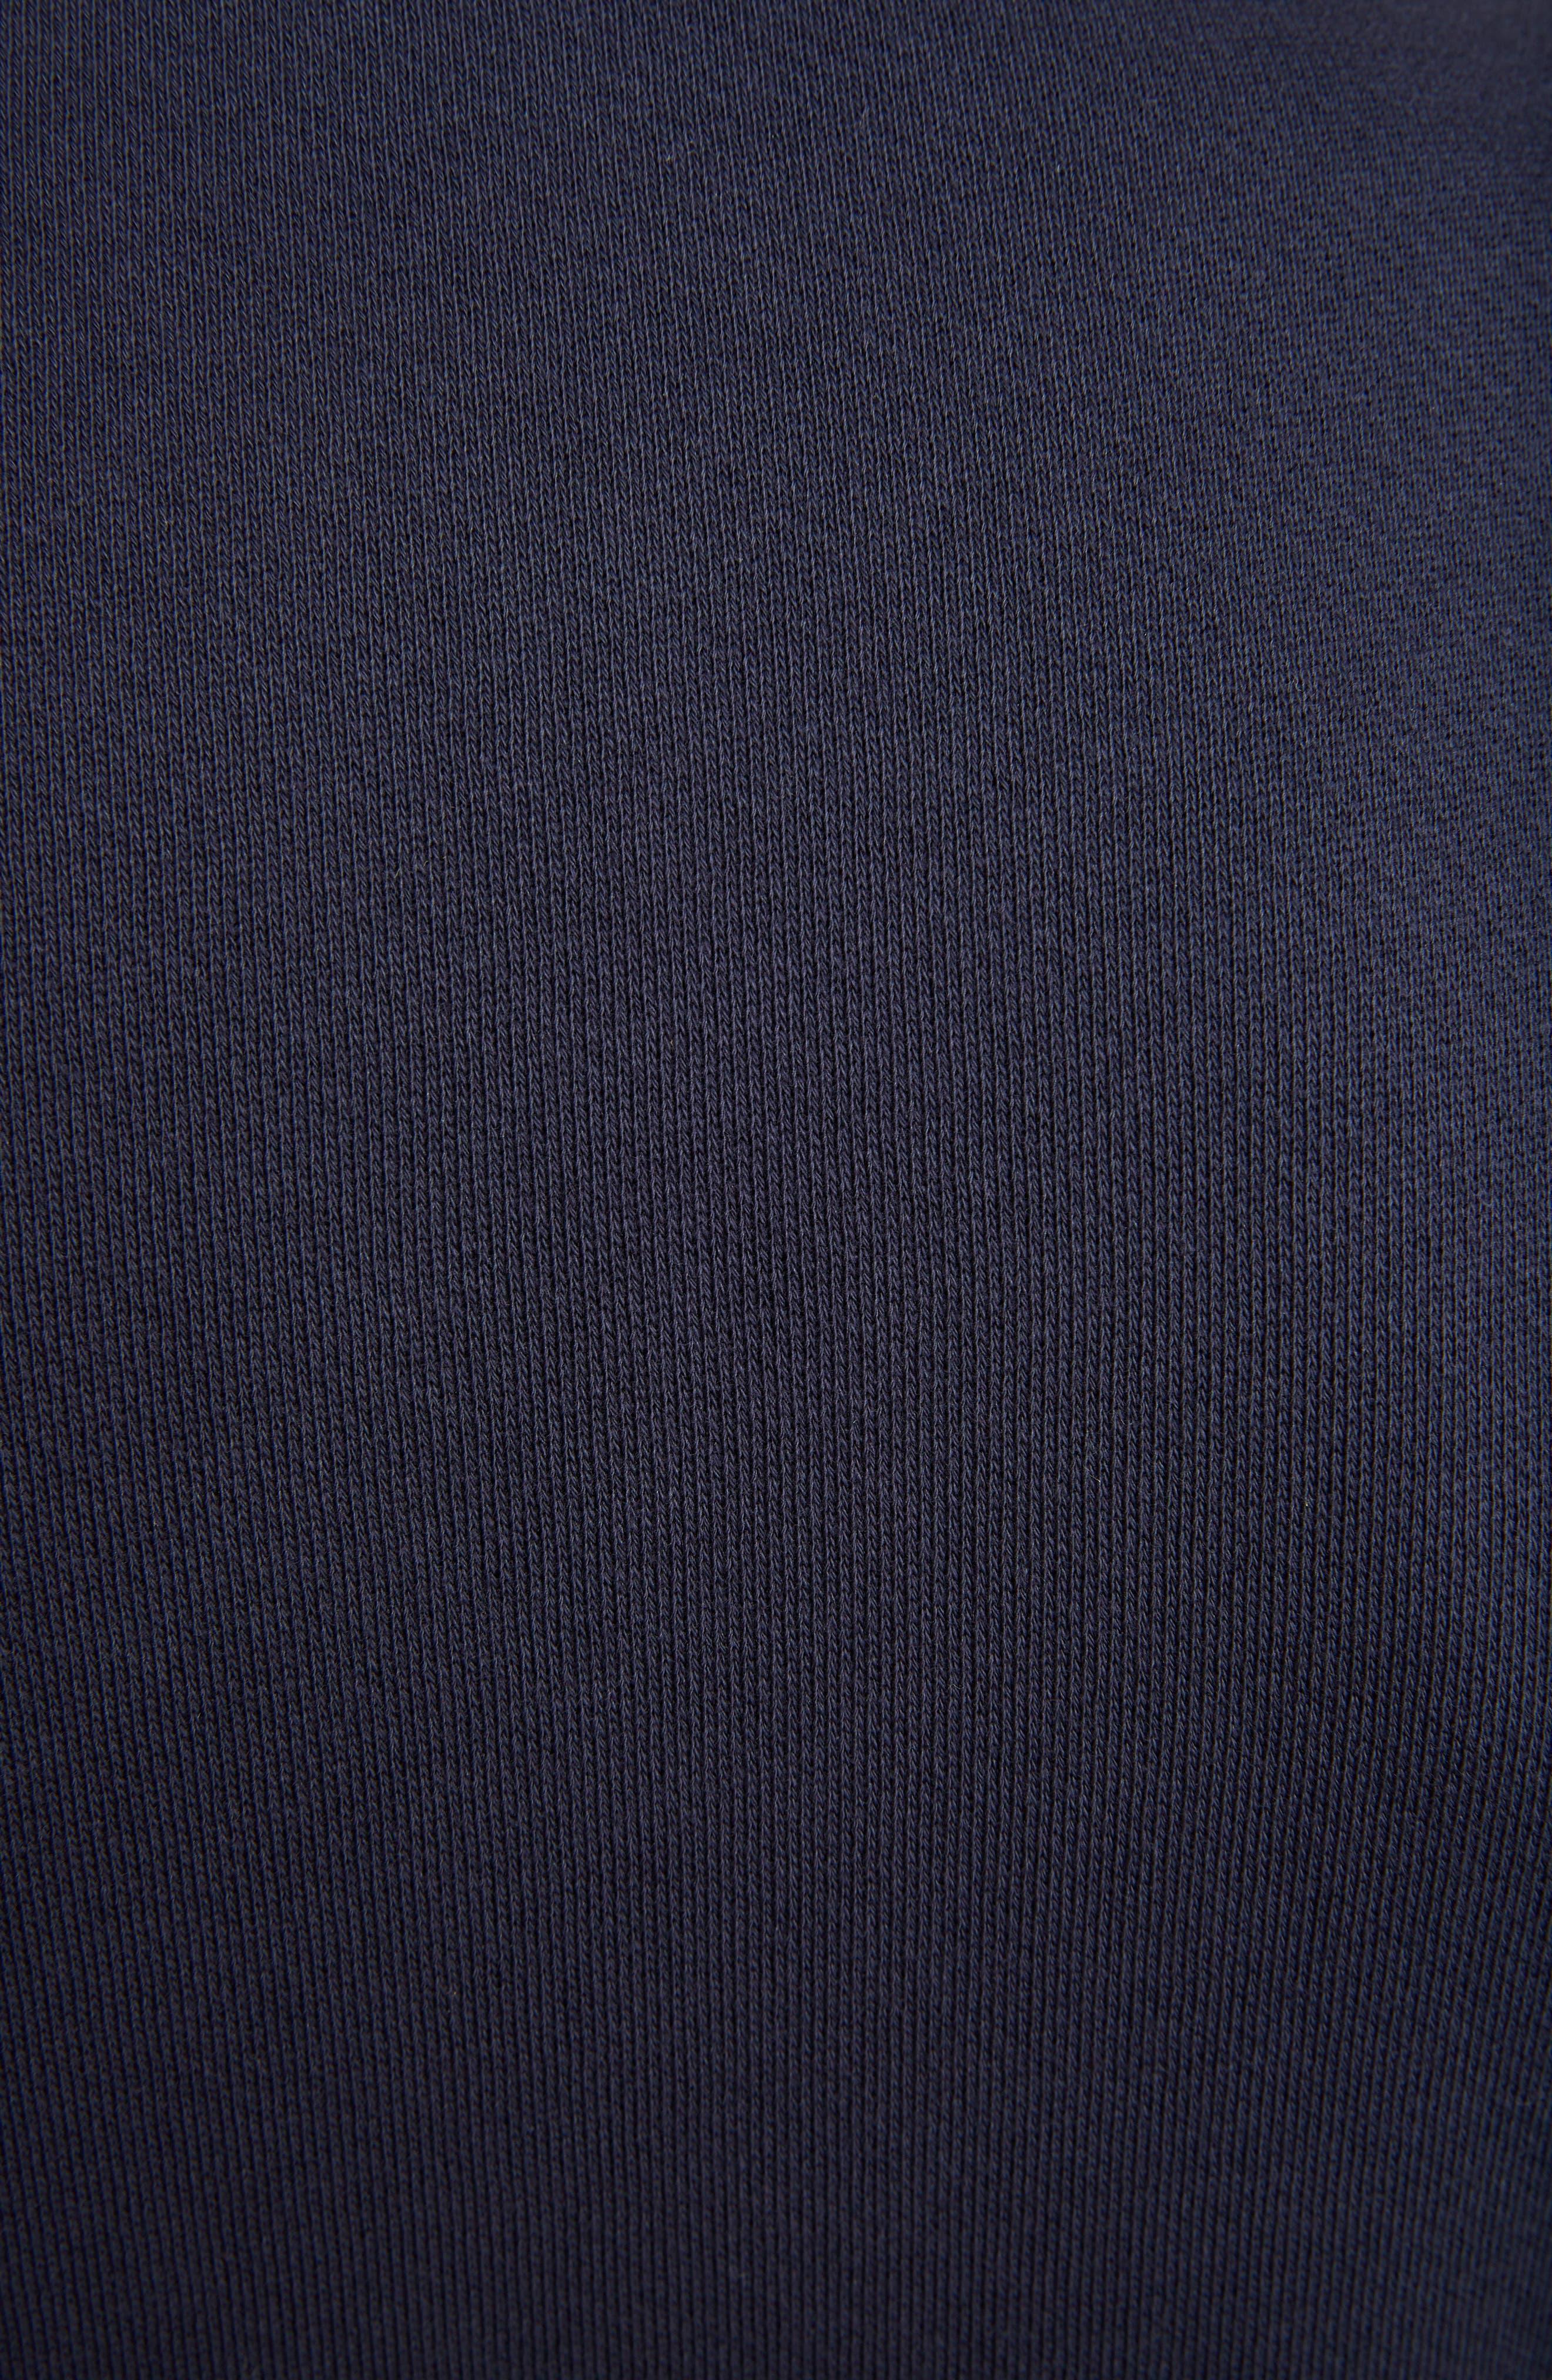 Anagram Sweatshirt,                             Alternate thumbnail 5, color,                             5387-NAVY BLUE/ MULTICOLOR